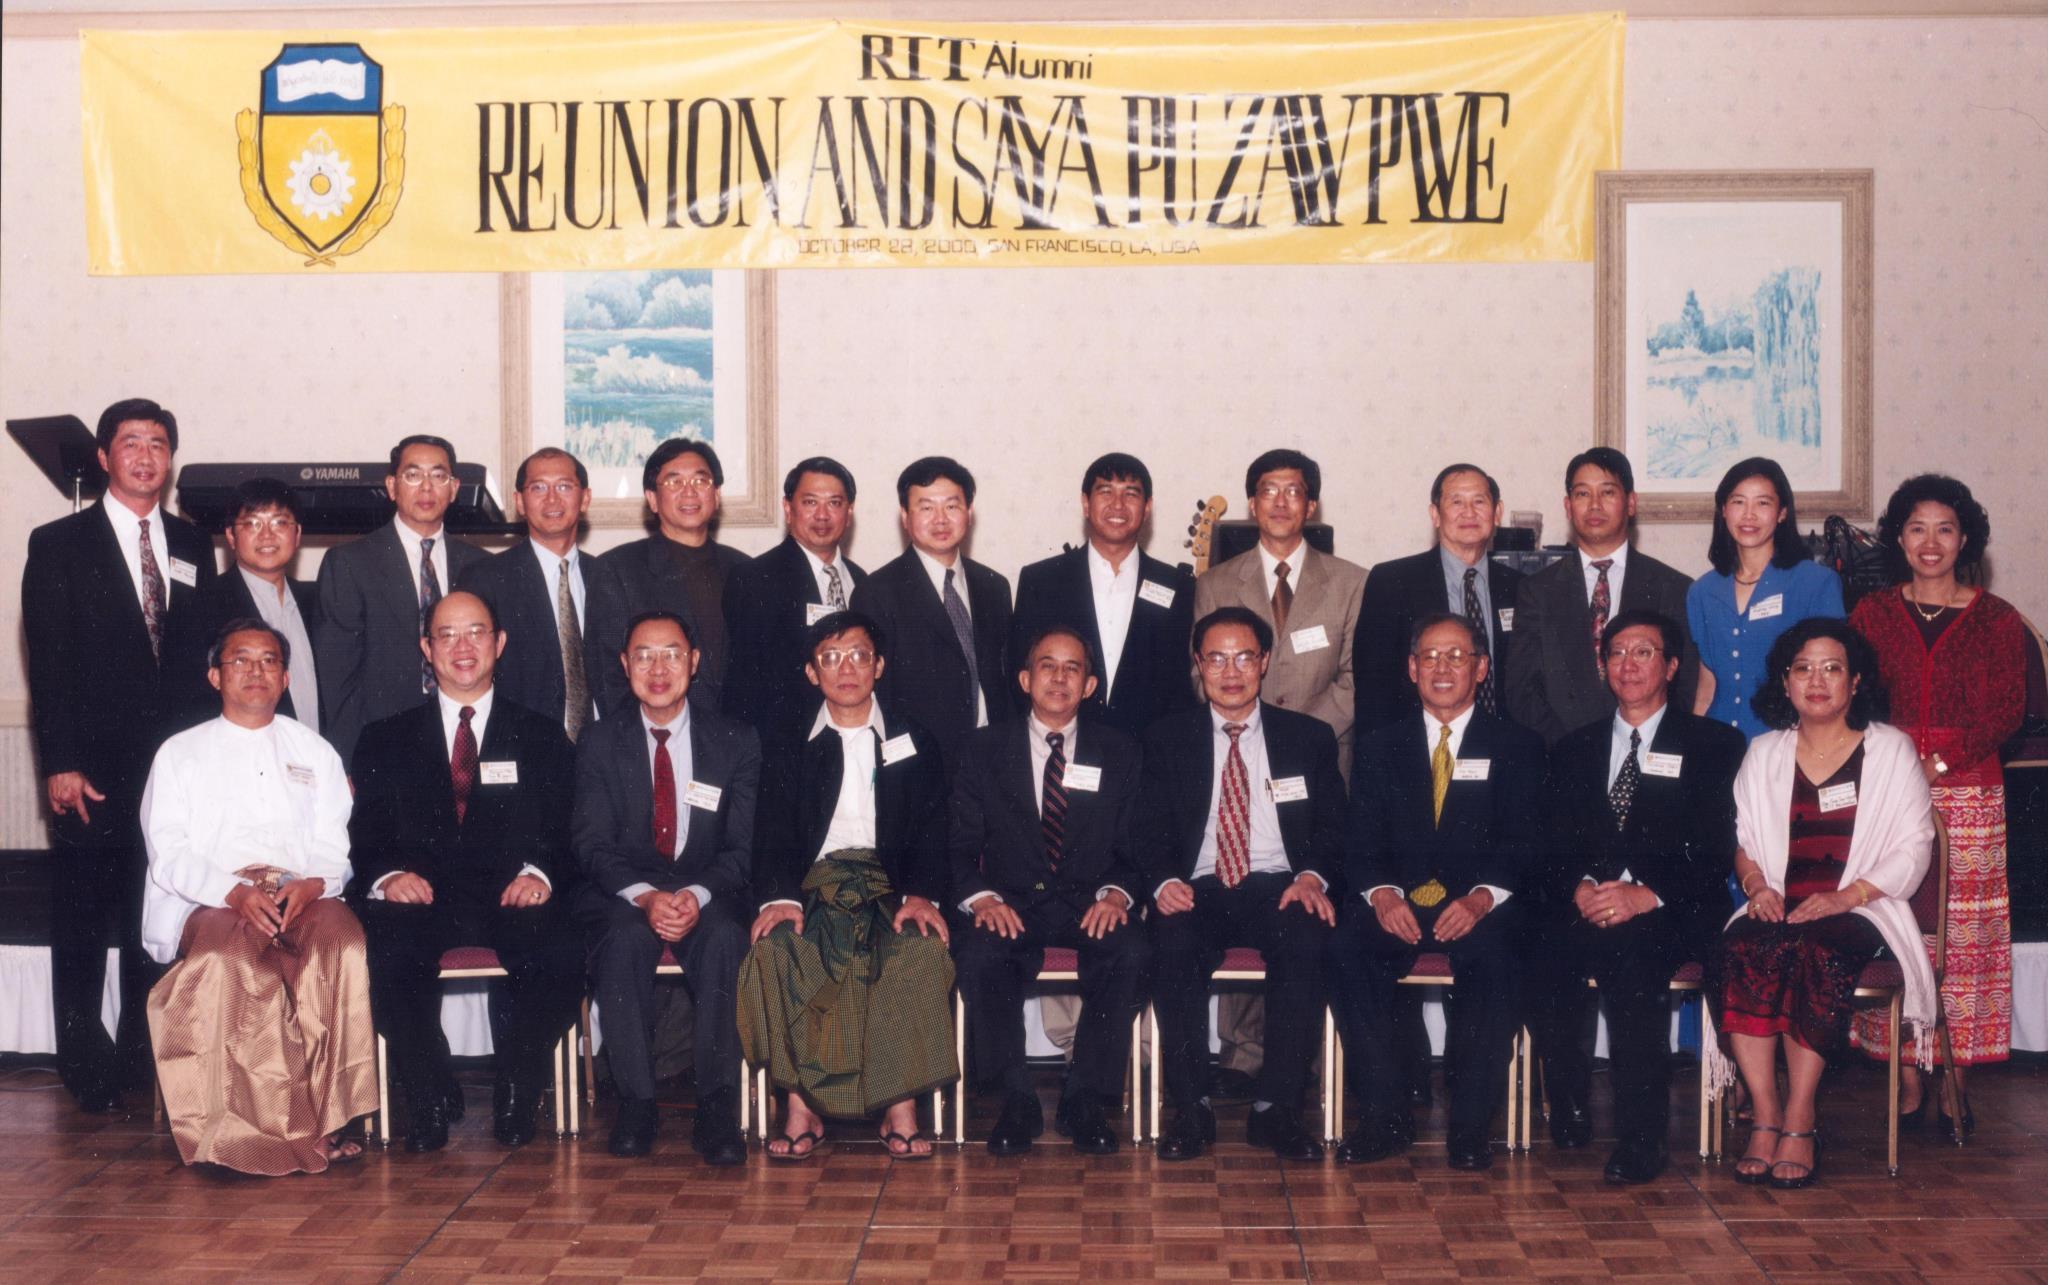 SPZP-2000 Organizers